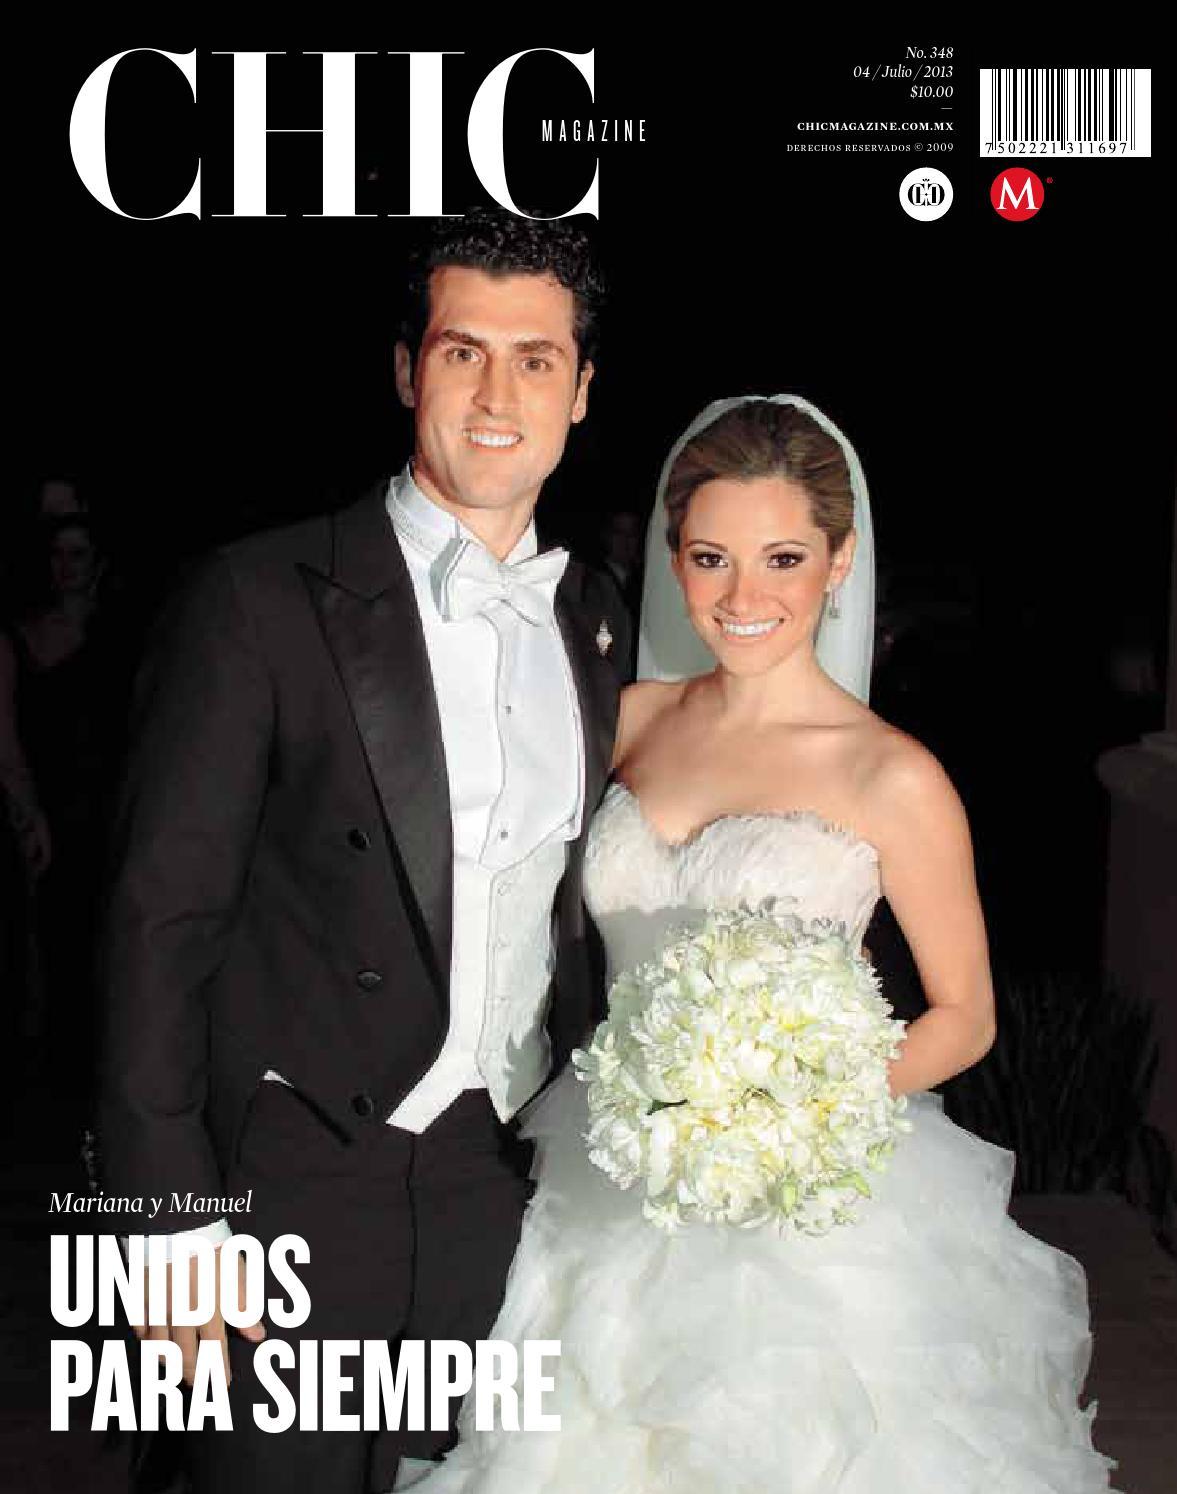 chic magazine monterrey 348 by chic magazine monterrey issuu